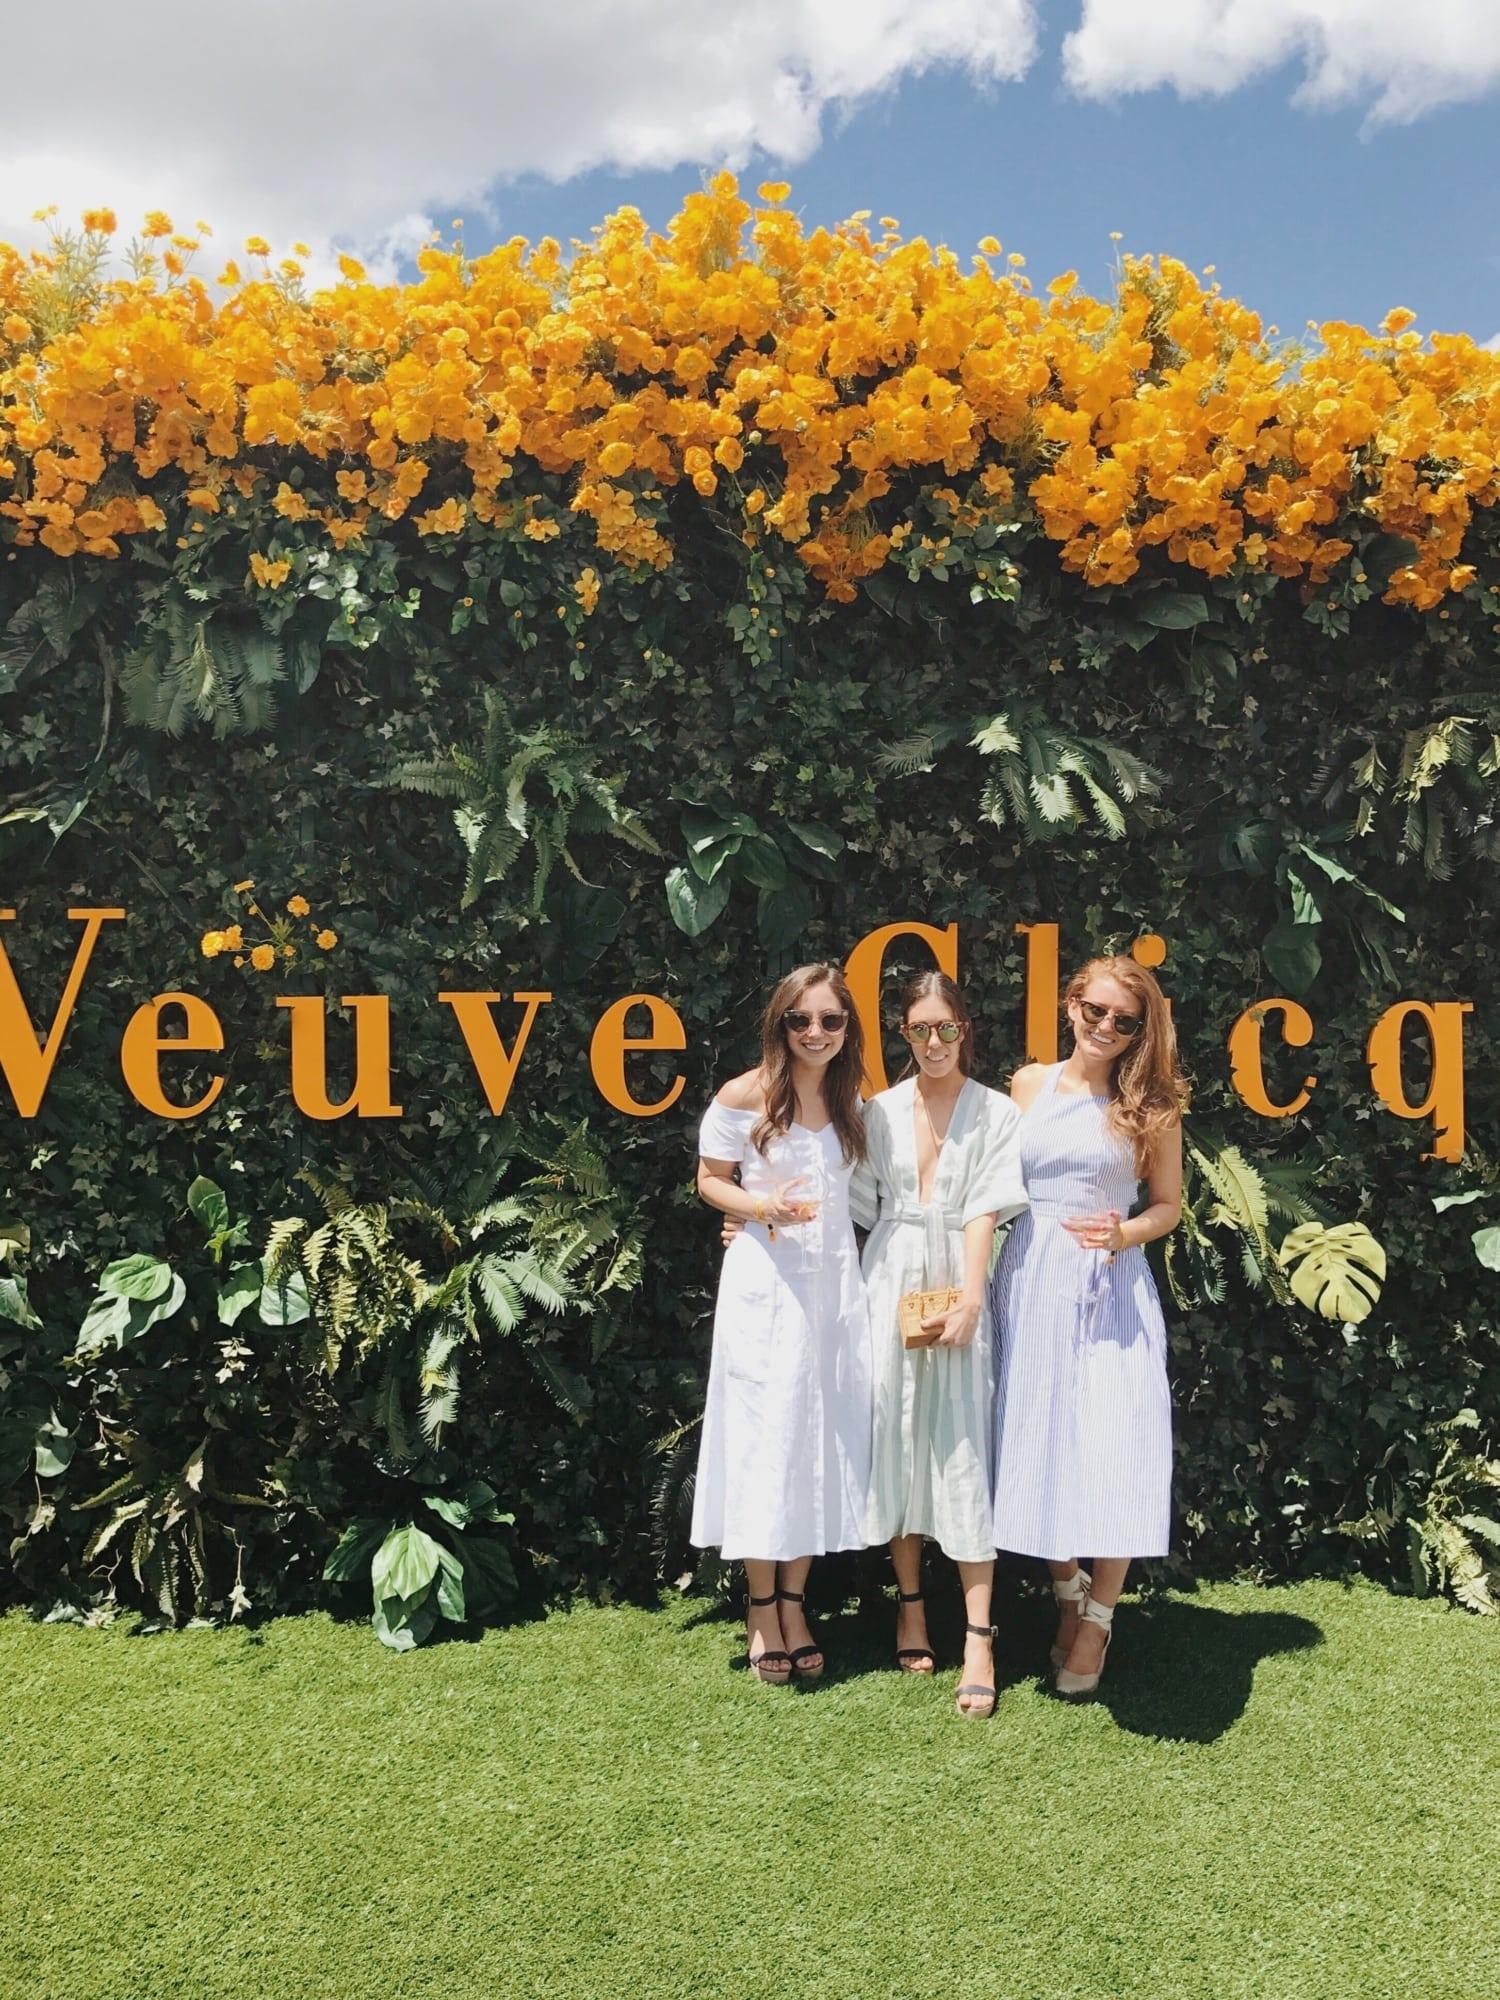 Ali Schilling, Amy Stone and Mackenzie Horan at the Veuve Clicquot Polo Classic